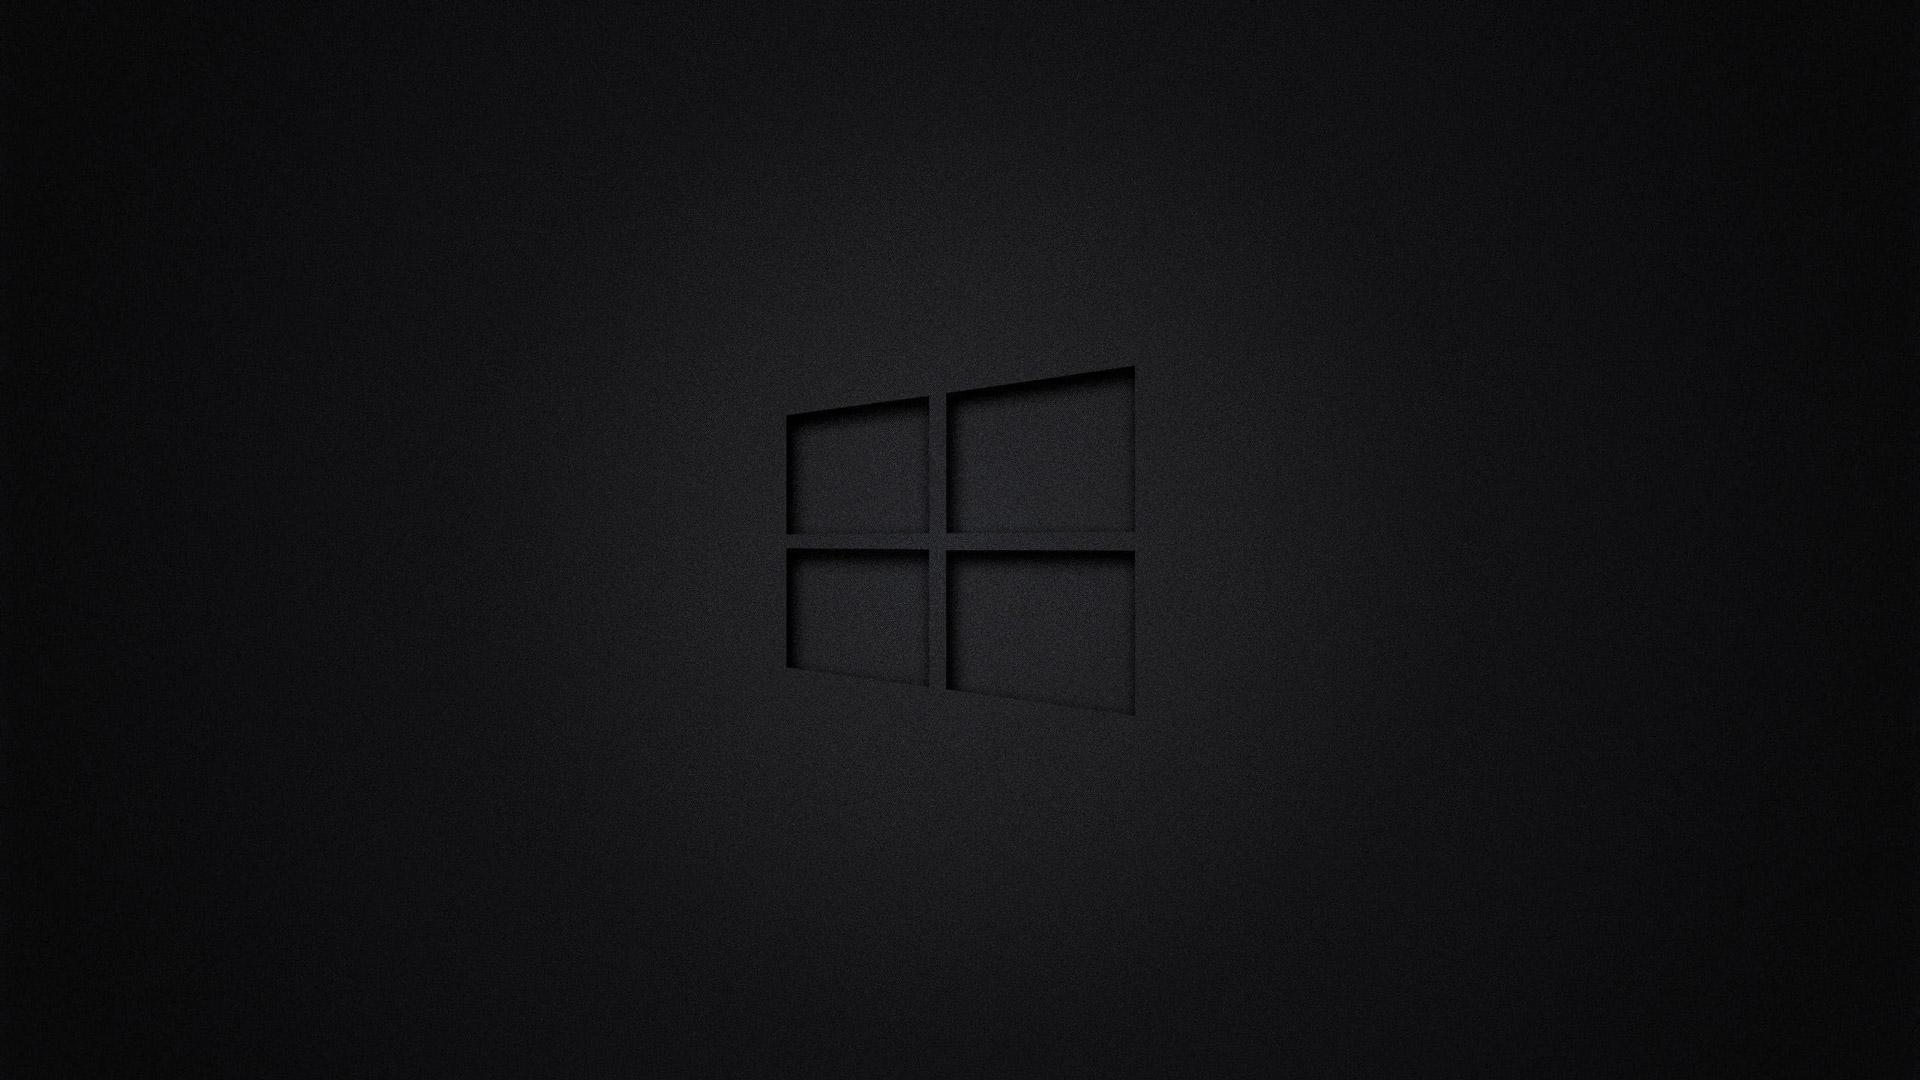 Windows-10-HD-Wallpaper-16